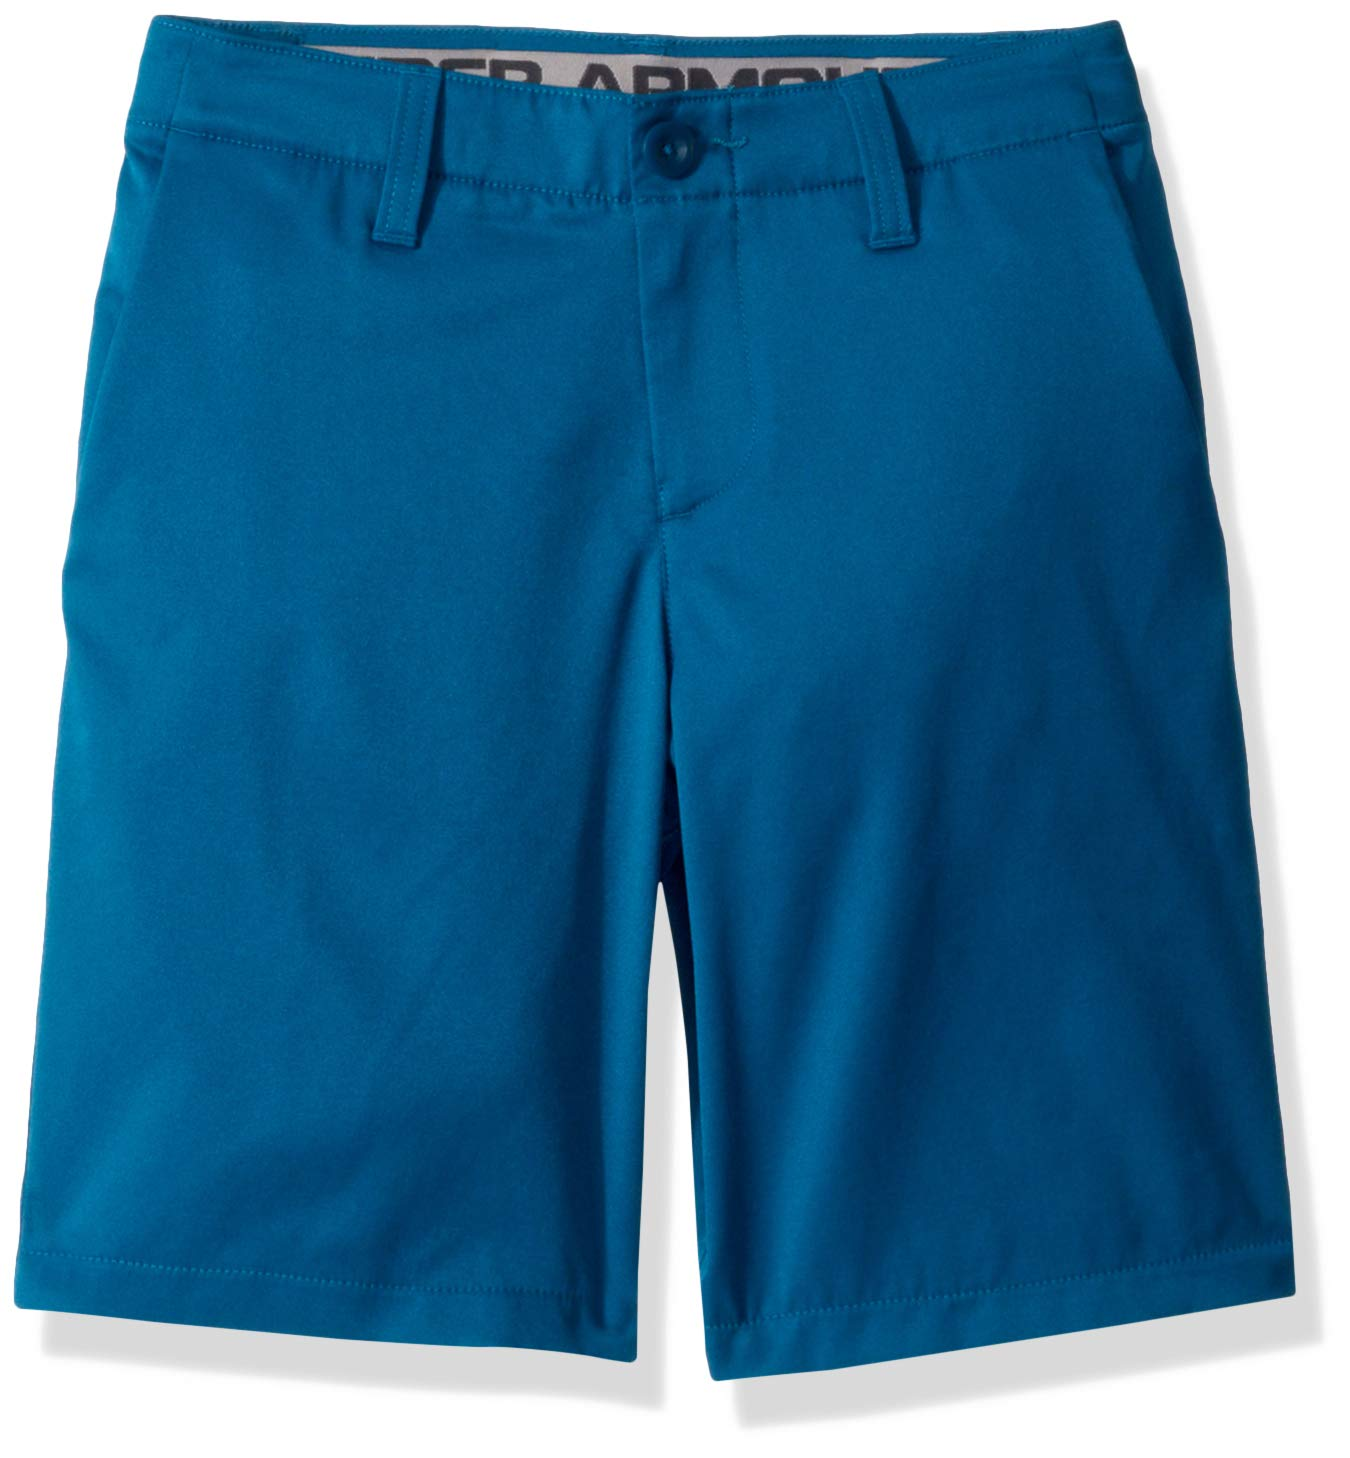 Under Armour boys Match Play 2.0 Golf Short, Teal Vibe (417)/Teal Vibe, 8